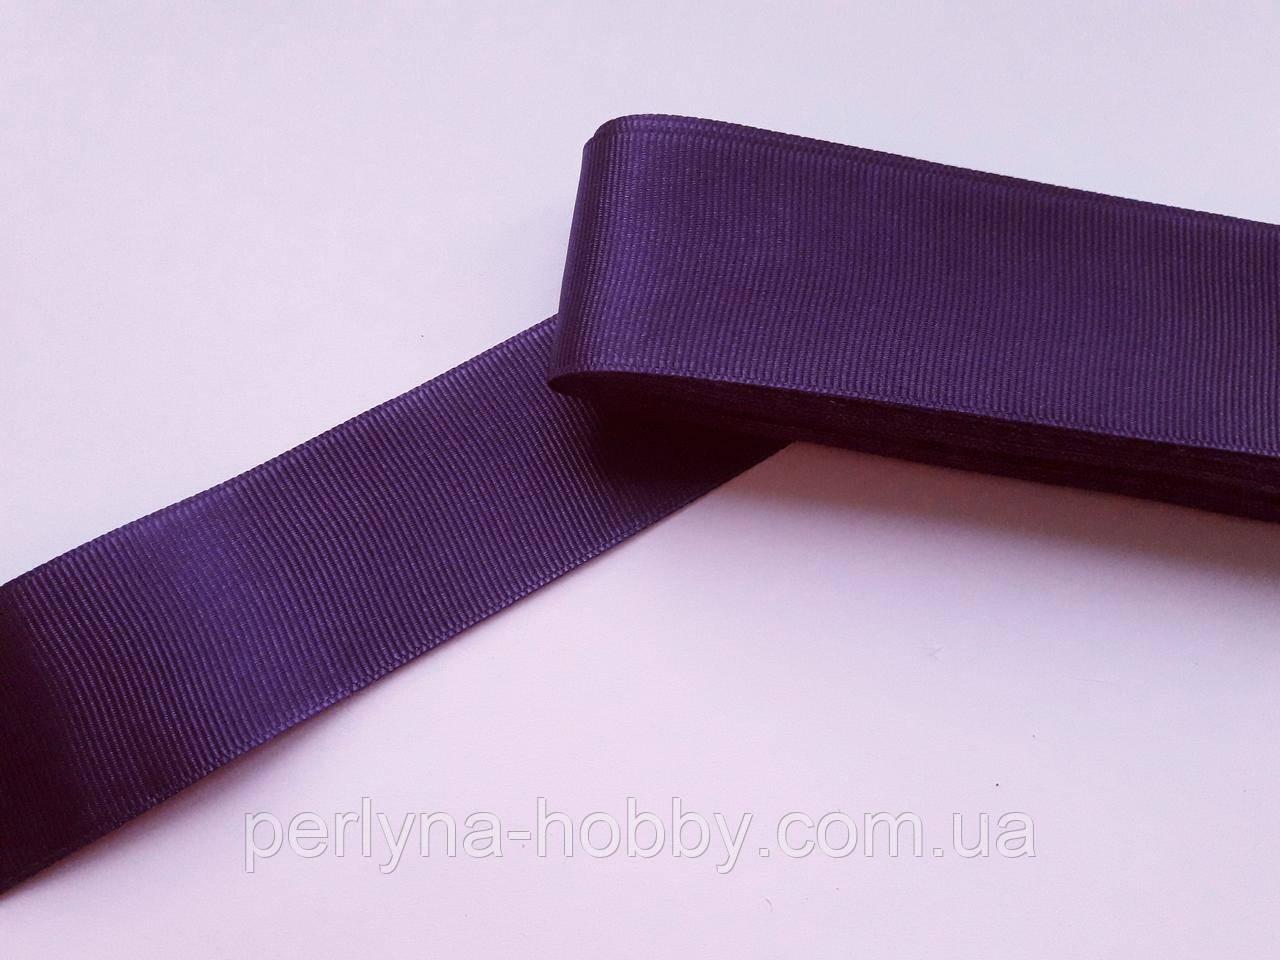 Тесьма лента репсовая широкая Стрічка репсова  4 см 40 мм, фіолетова №37. Туреччина